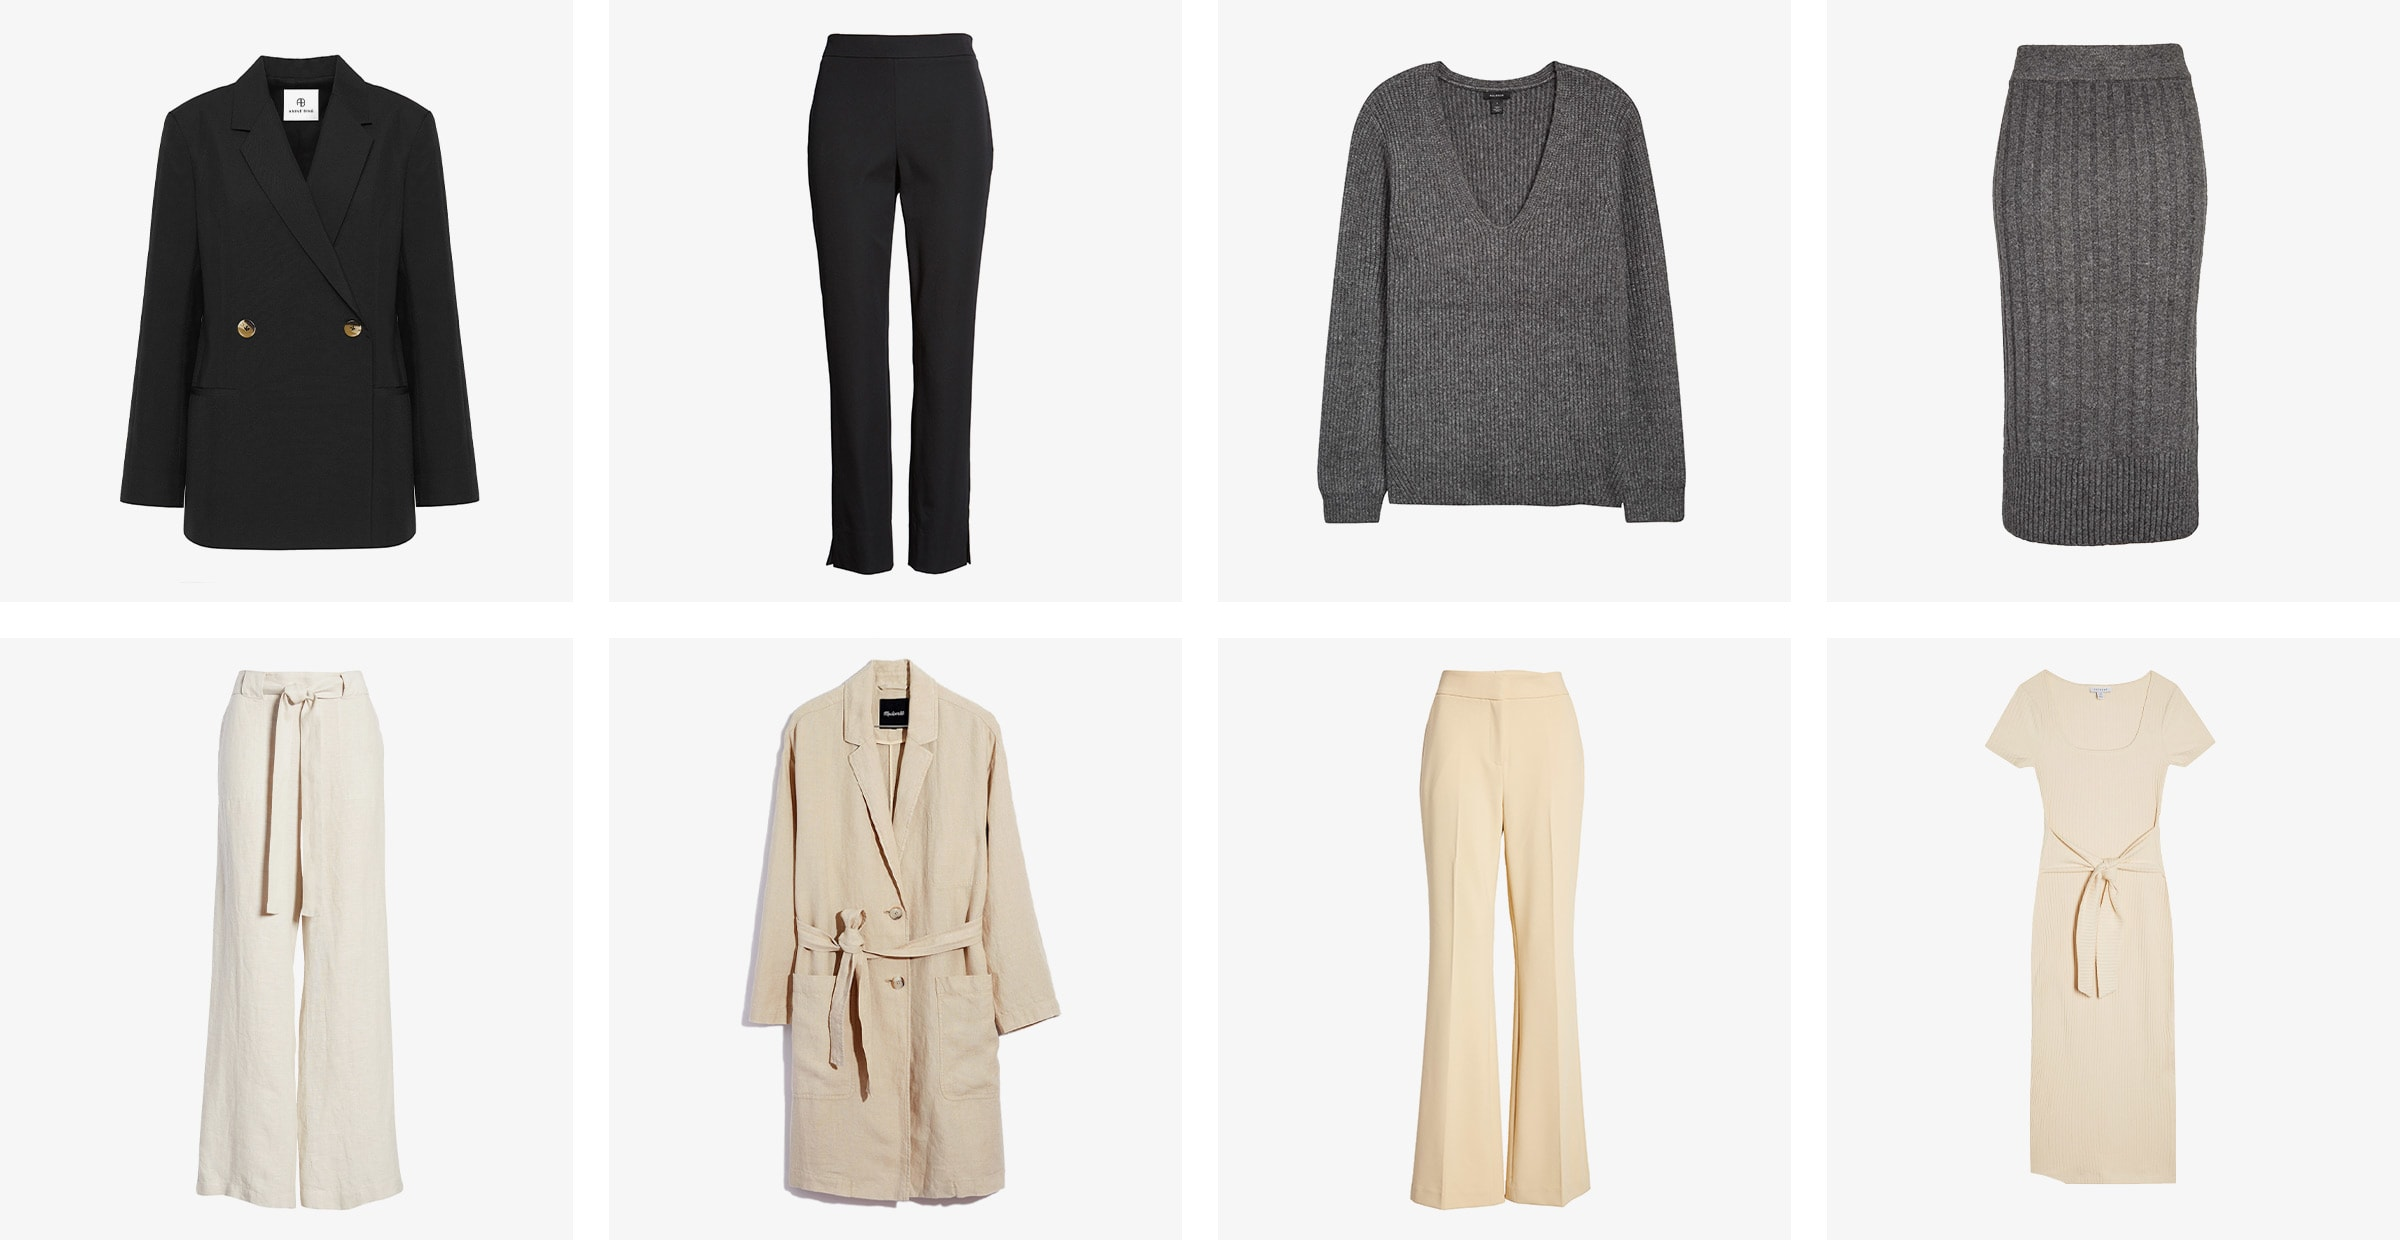 Women's neutral fall collection: blazer, sweater, skirt and a dress